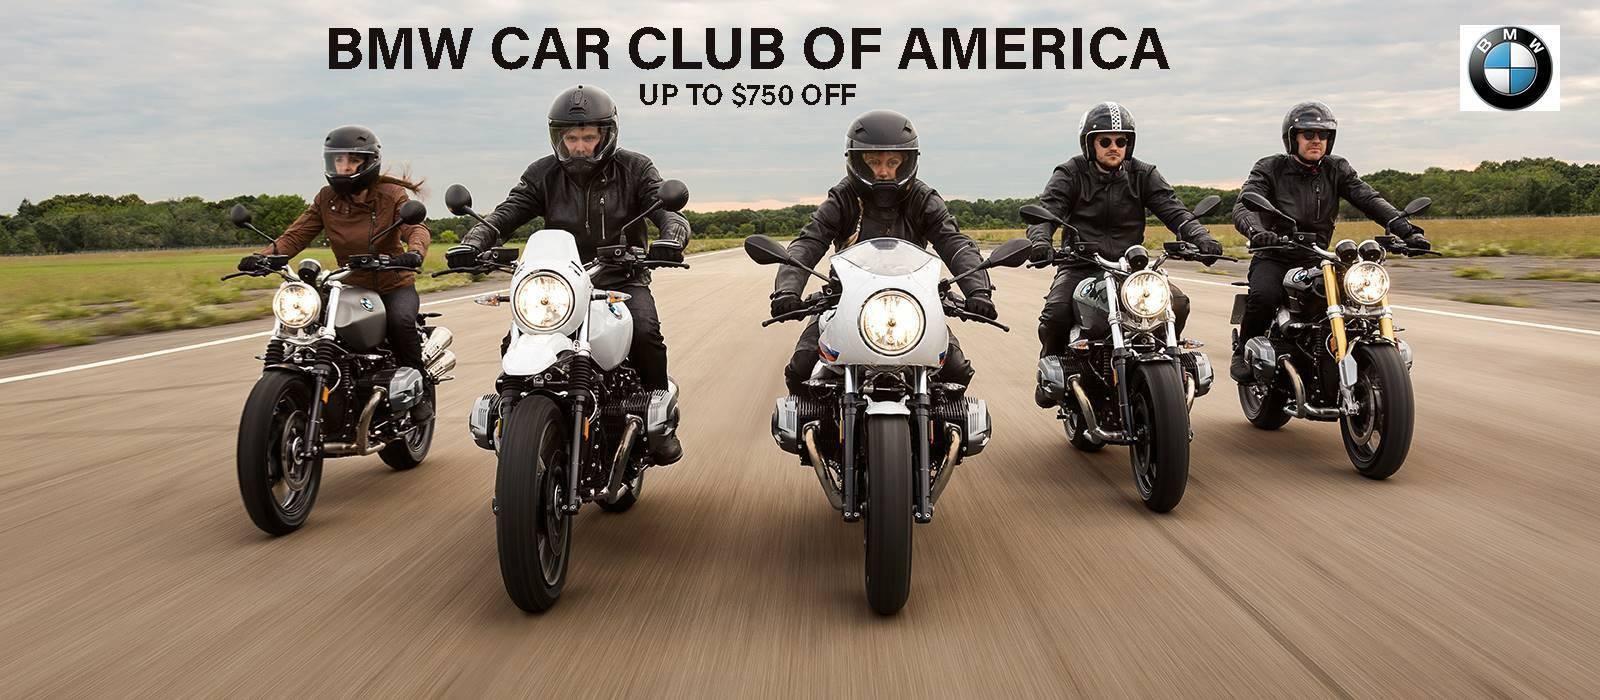 Polaris, Indian, BMW, Honda, Slingshot Motorcycle Dealer - Tulsa, OK - 5th Gear Cycle